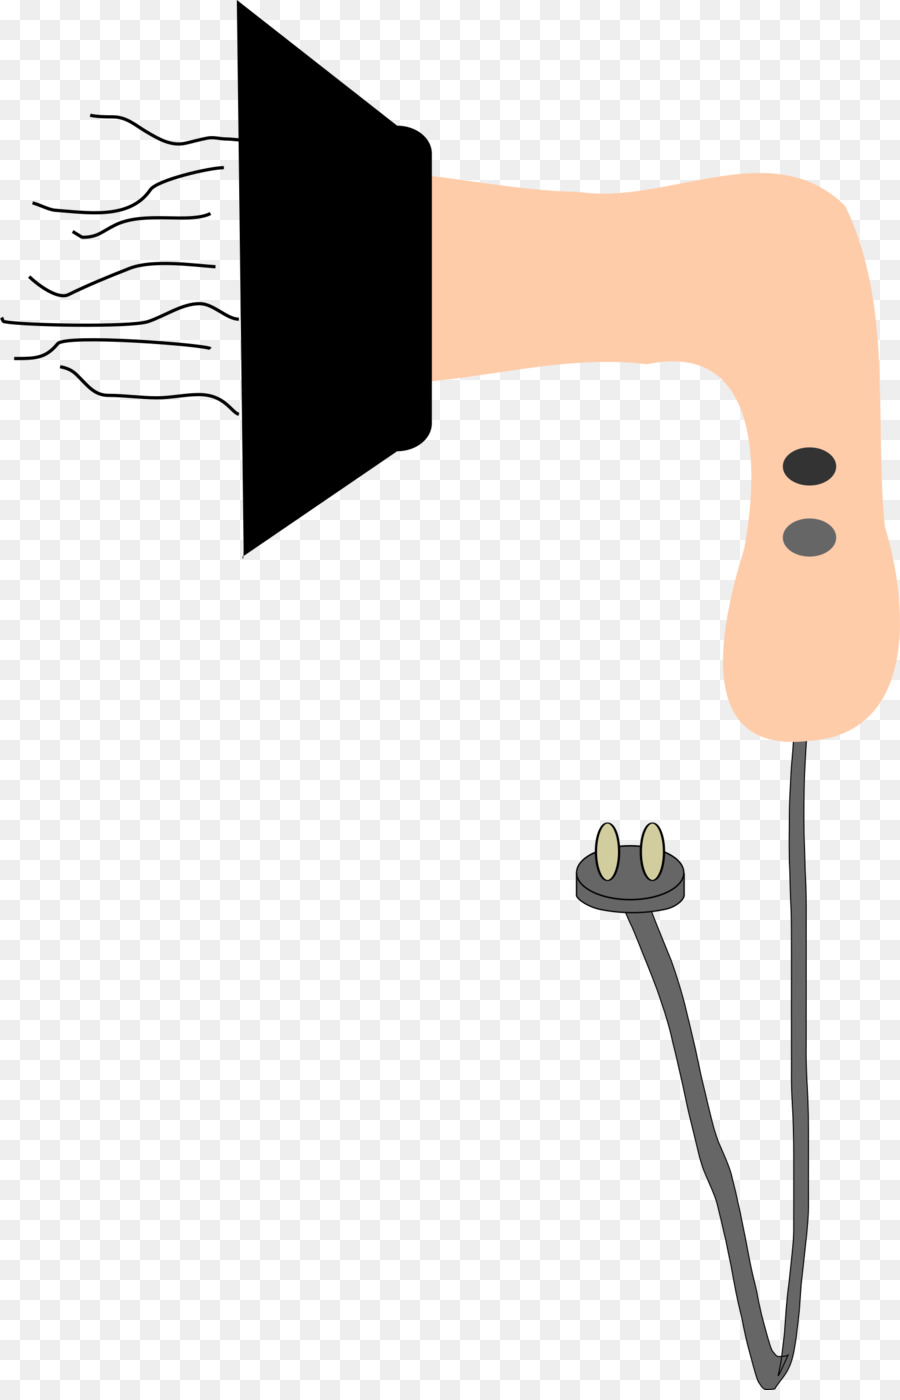 medium resolution of hair dryer clipart comb hair dryers